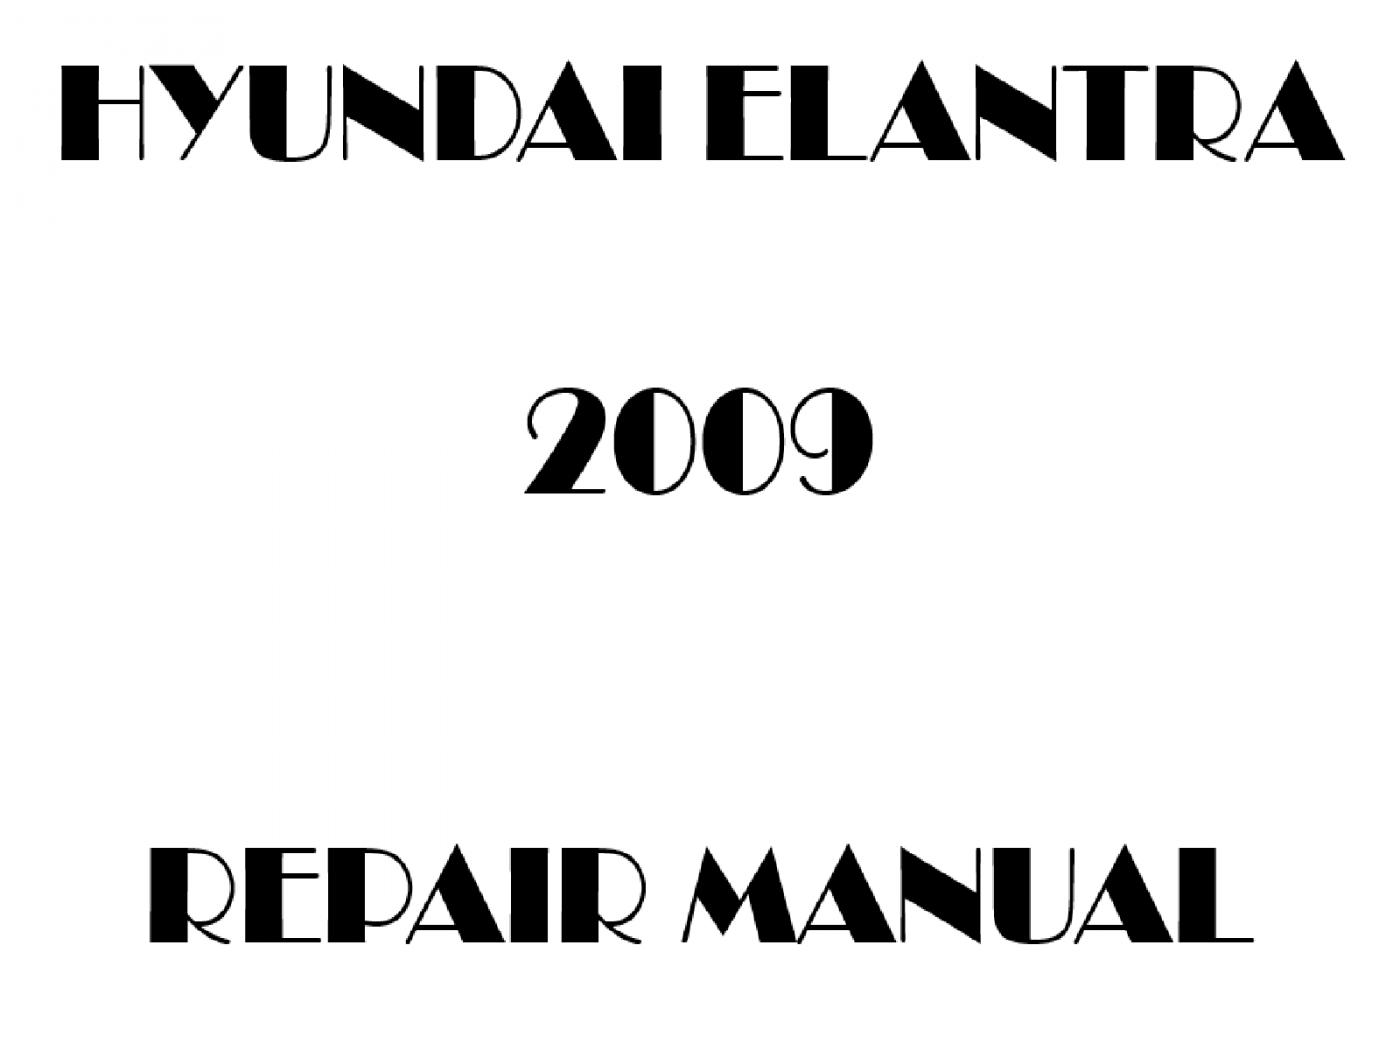 2009 Hyundai Elantra repair manual